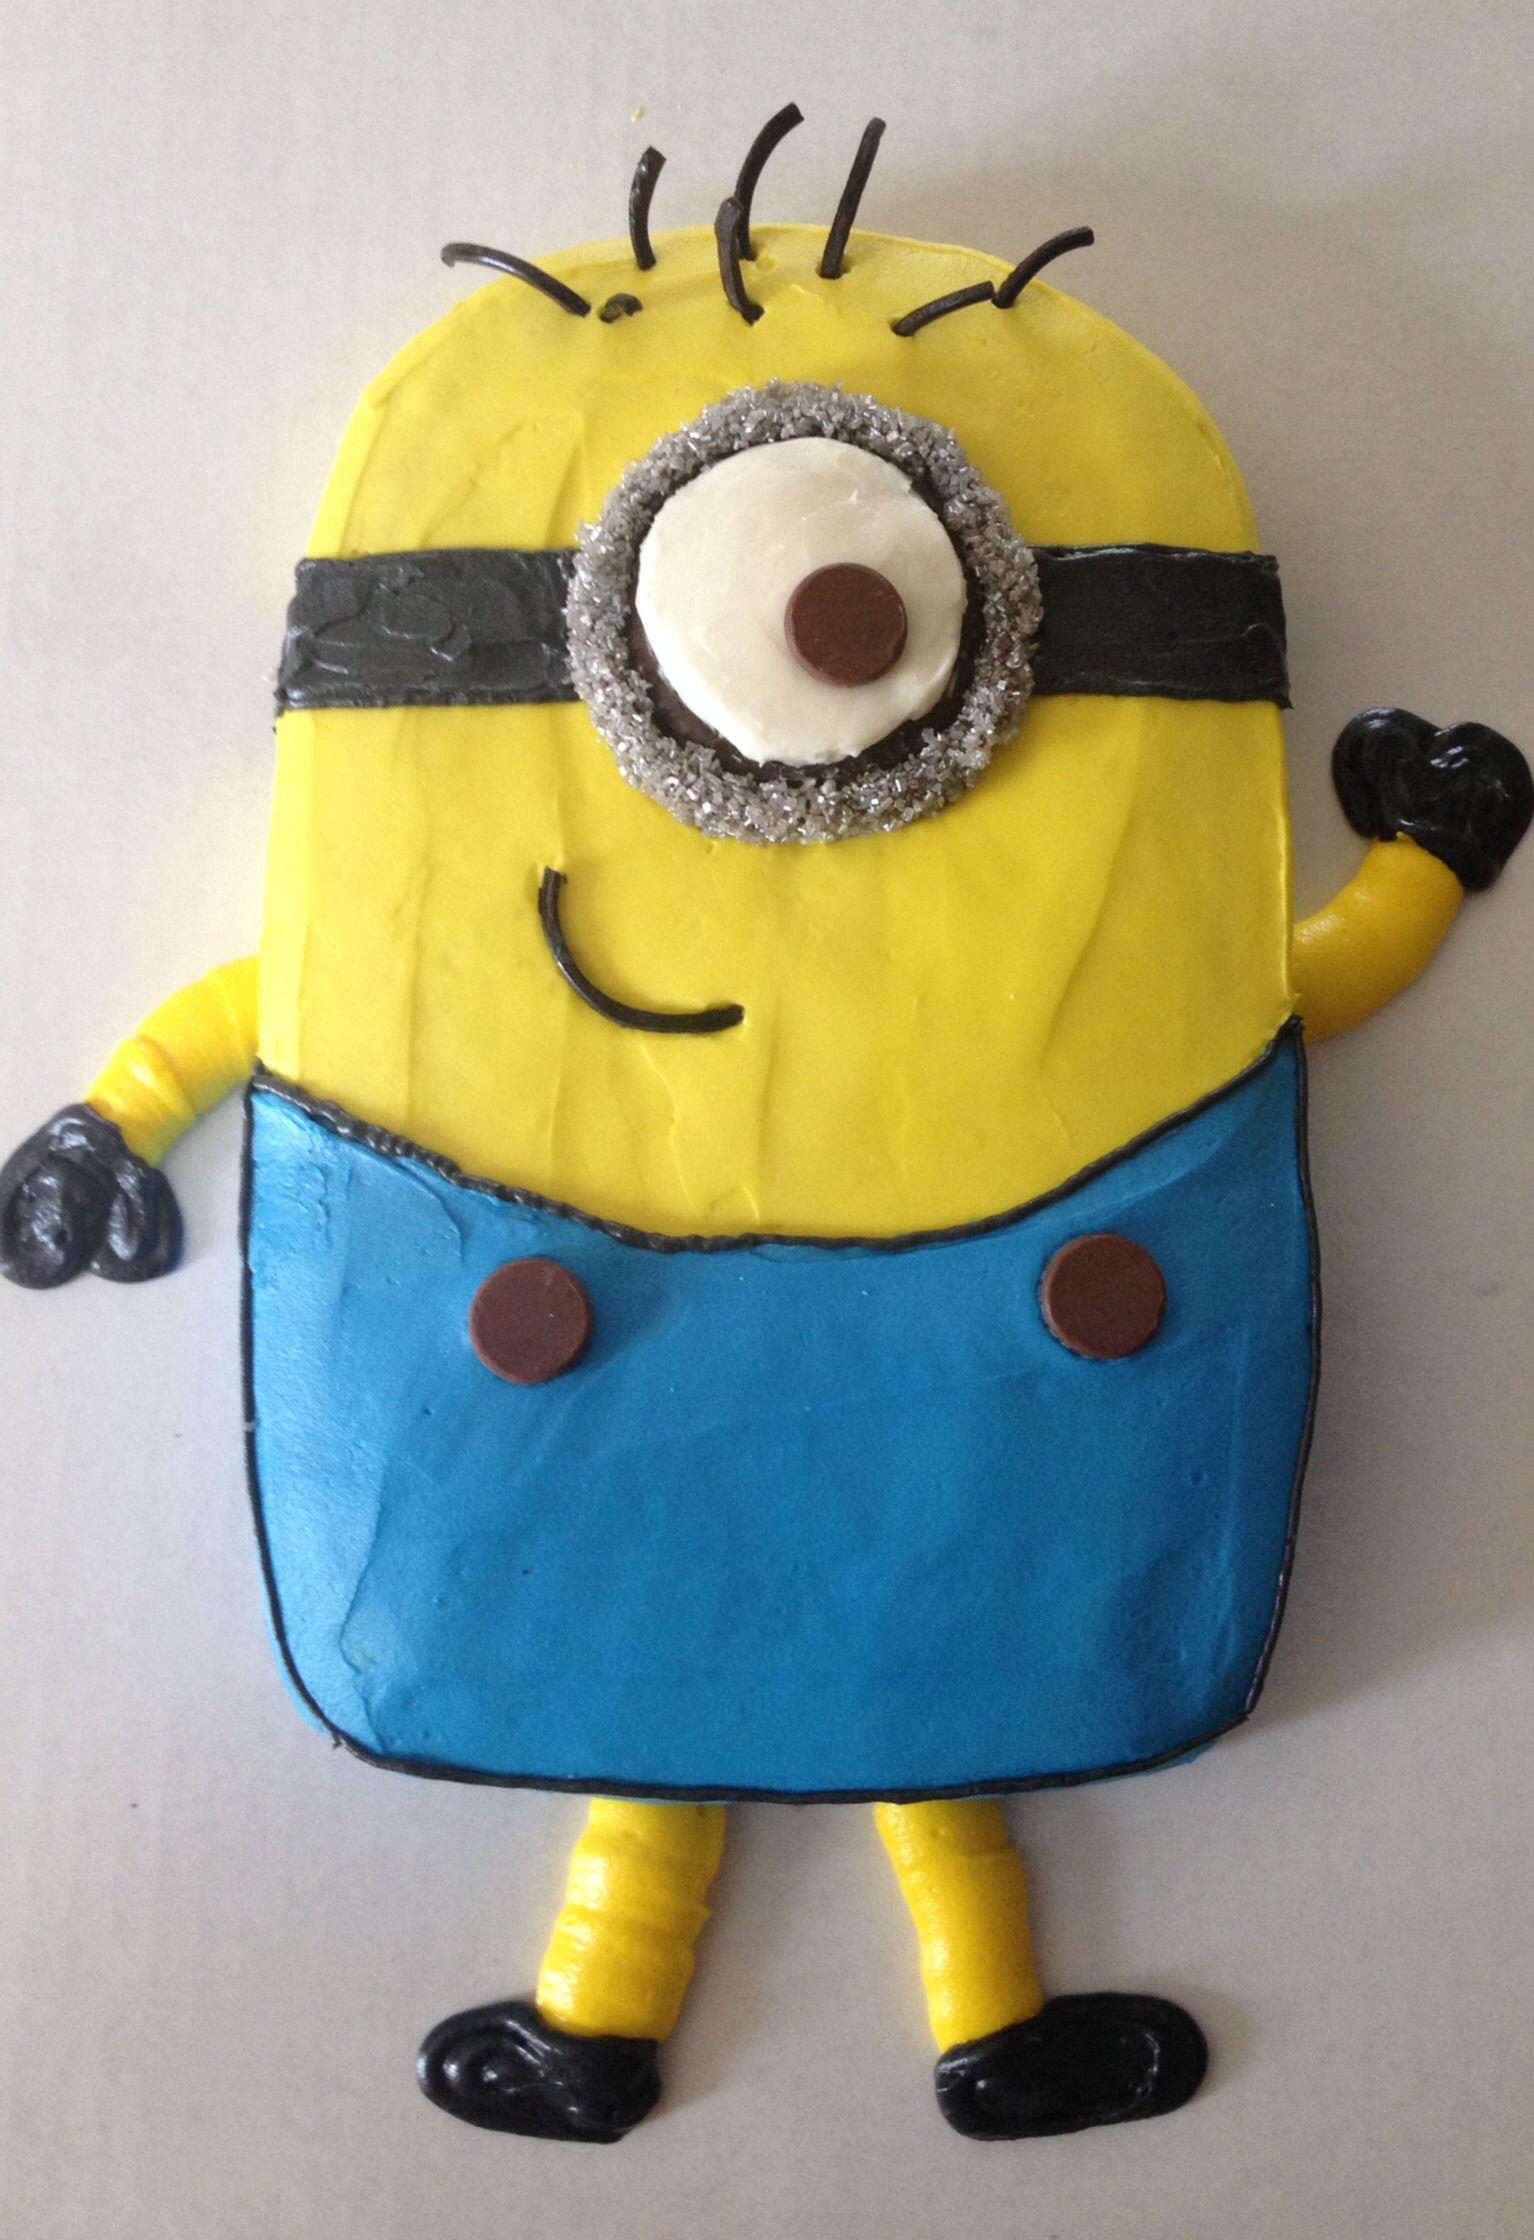 Minion Cake Design Pinterest : Minion cake cake decorating ideas Pinterest